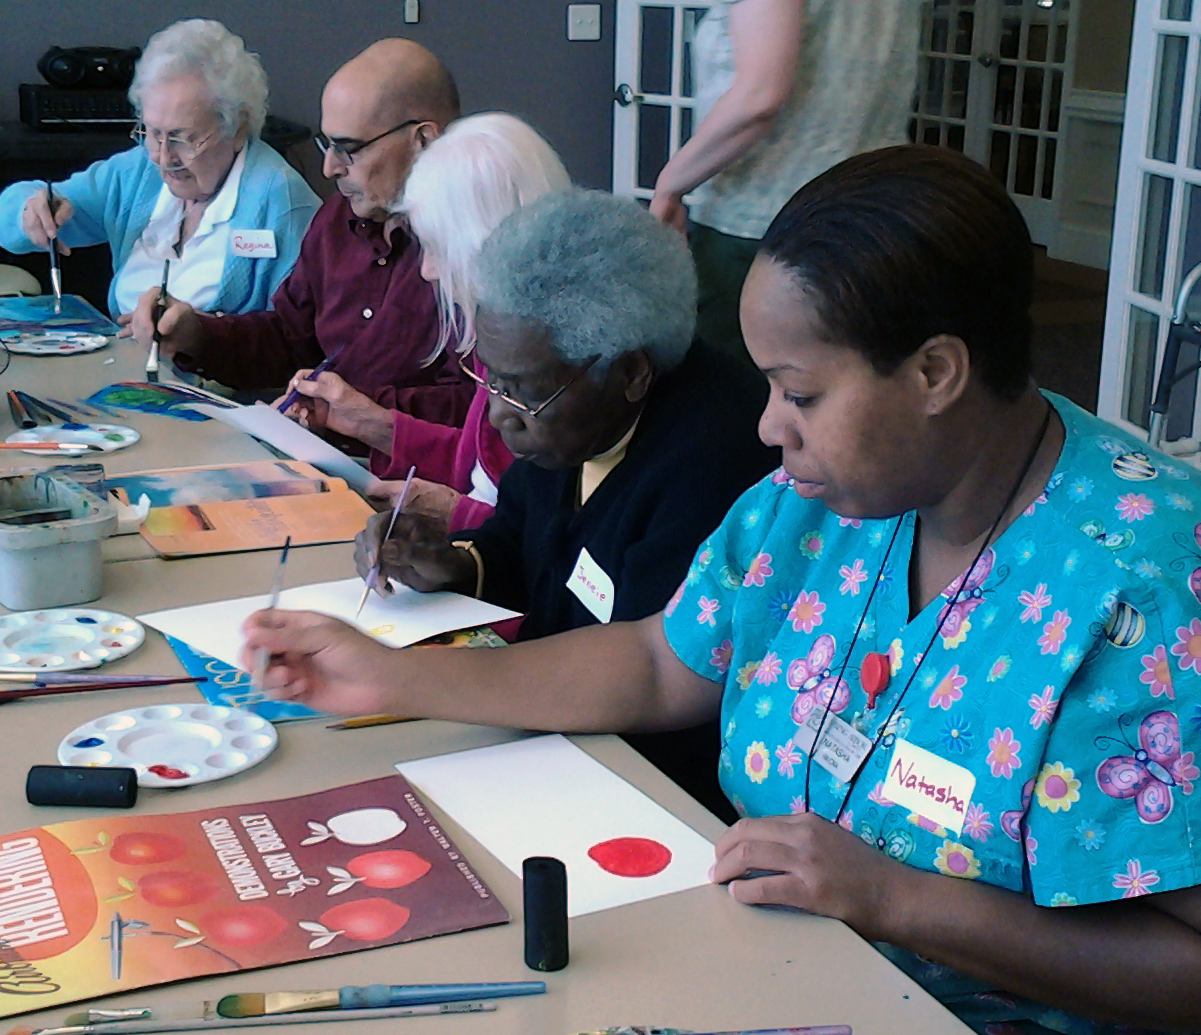 Creative Aging Network's Visual Art Program